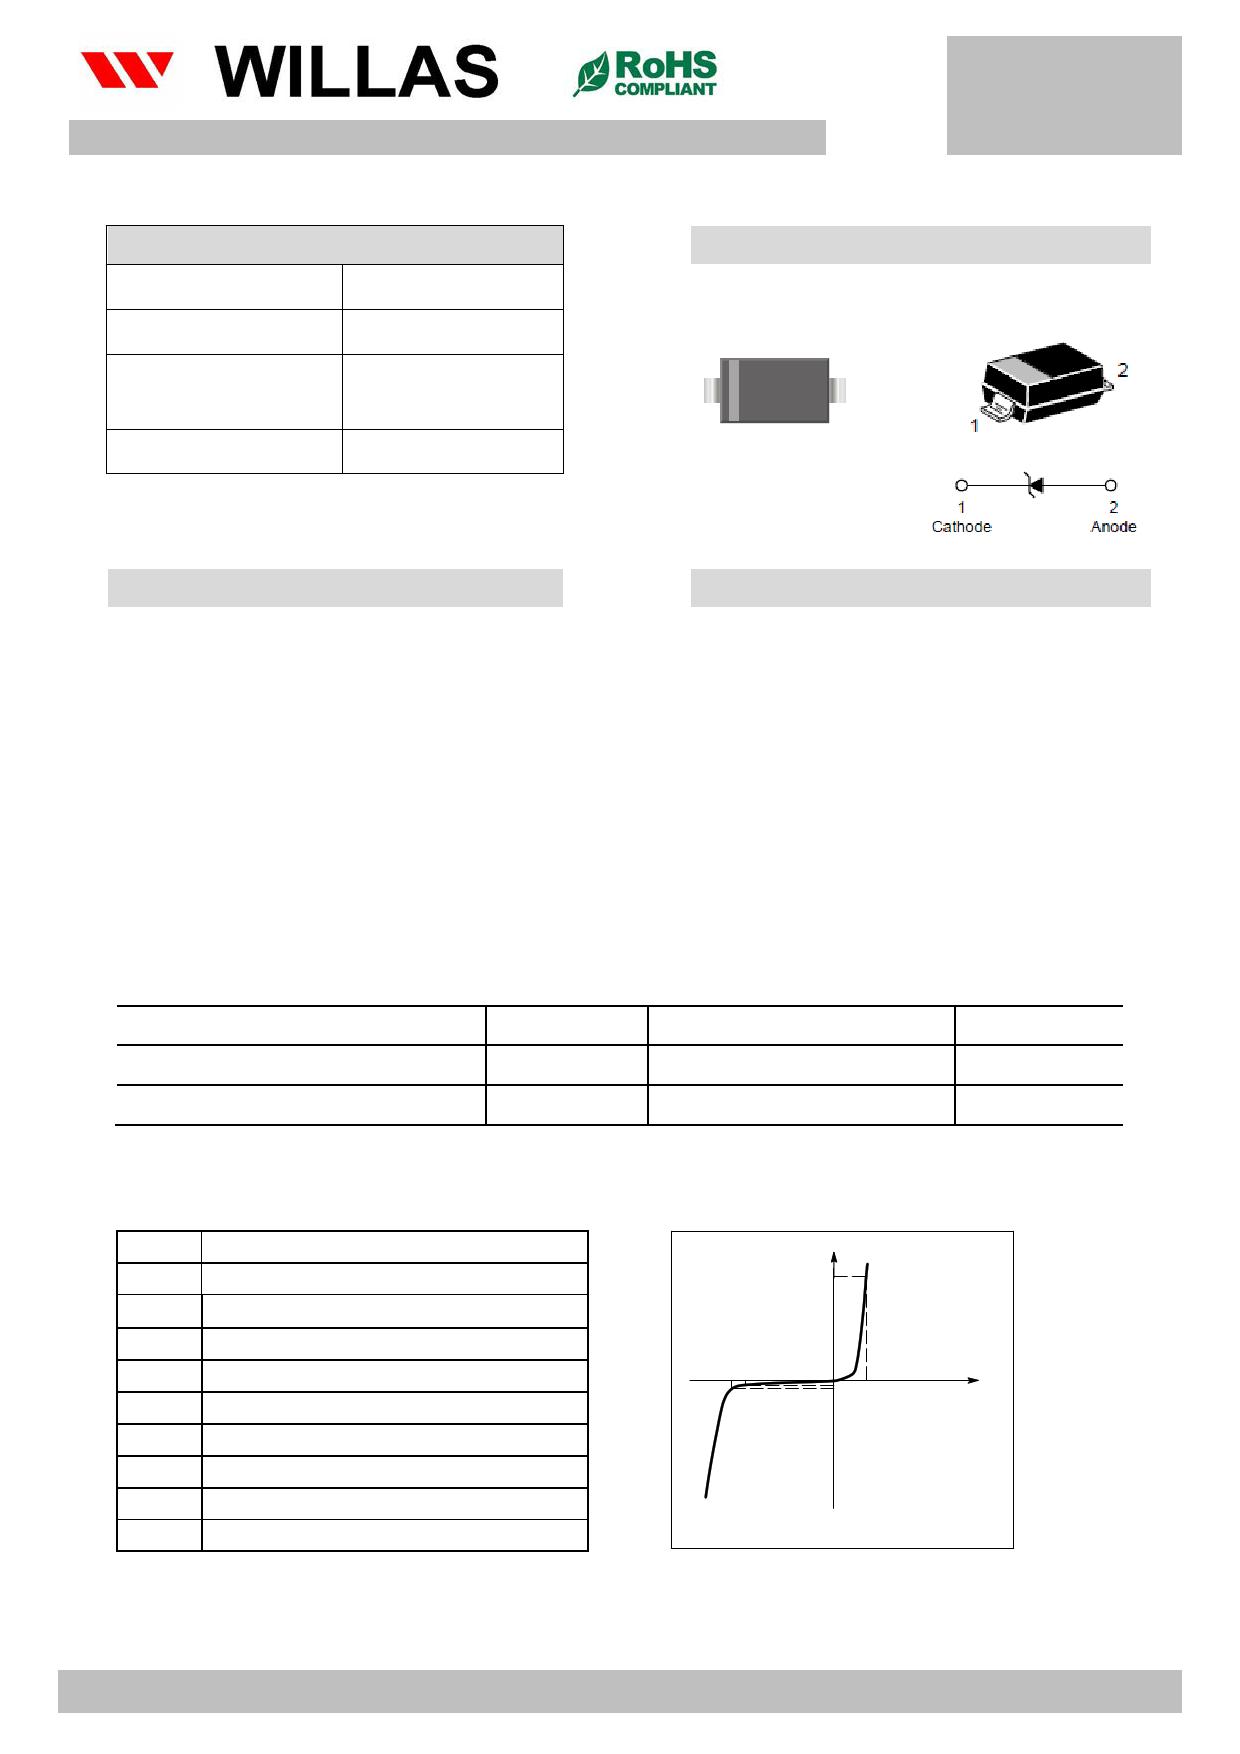 MMSZ5225B Datasheet